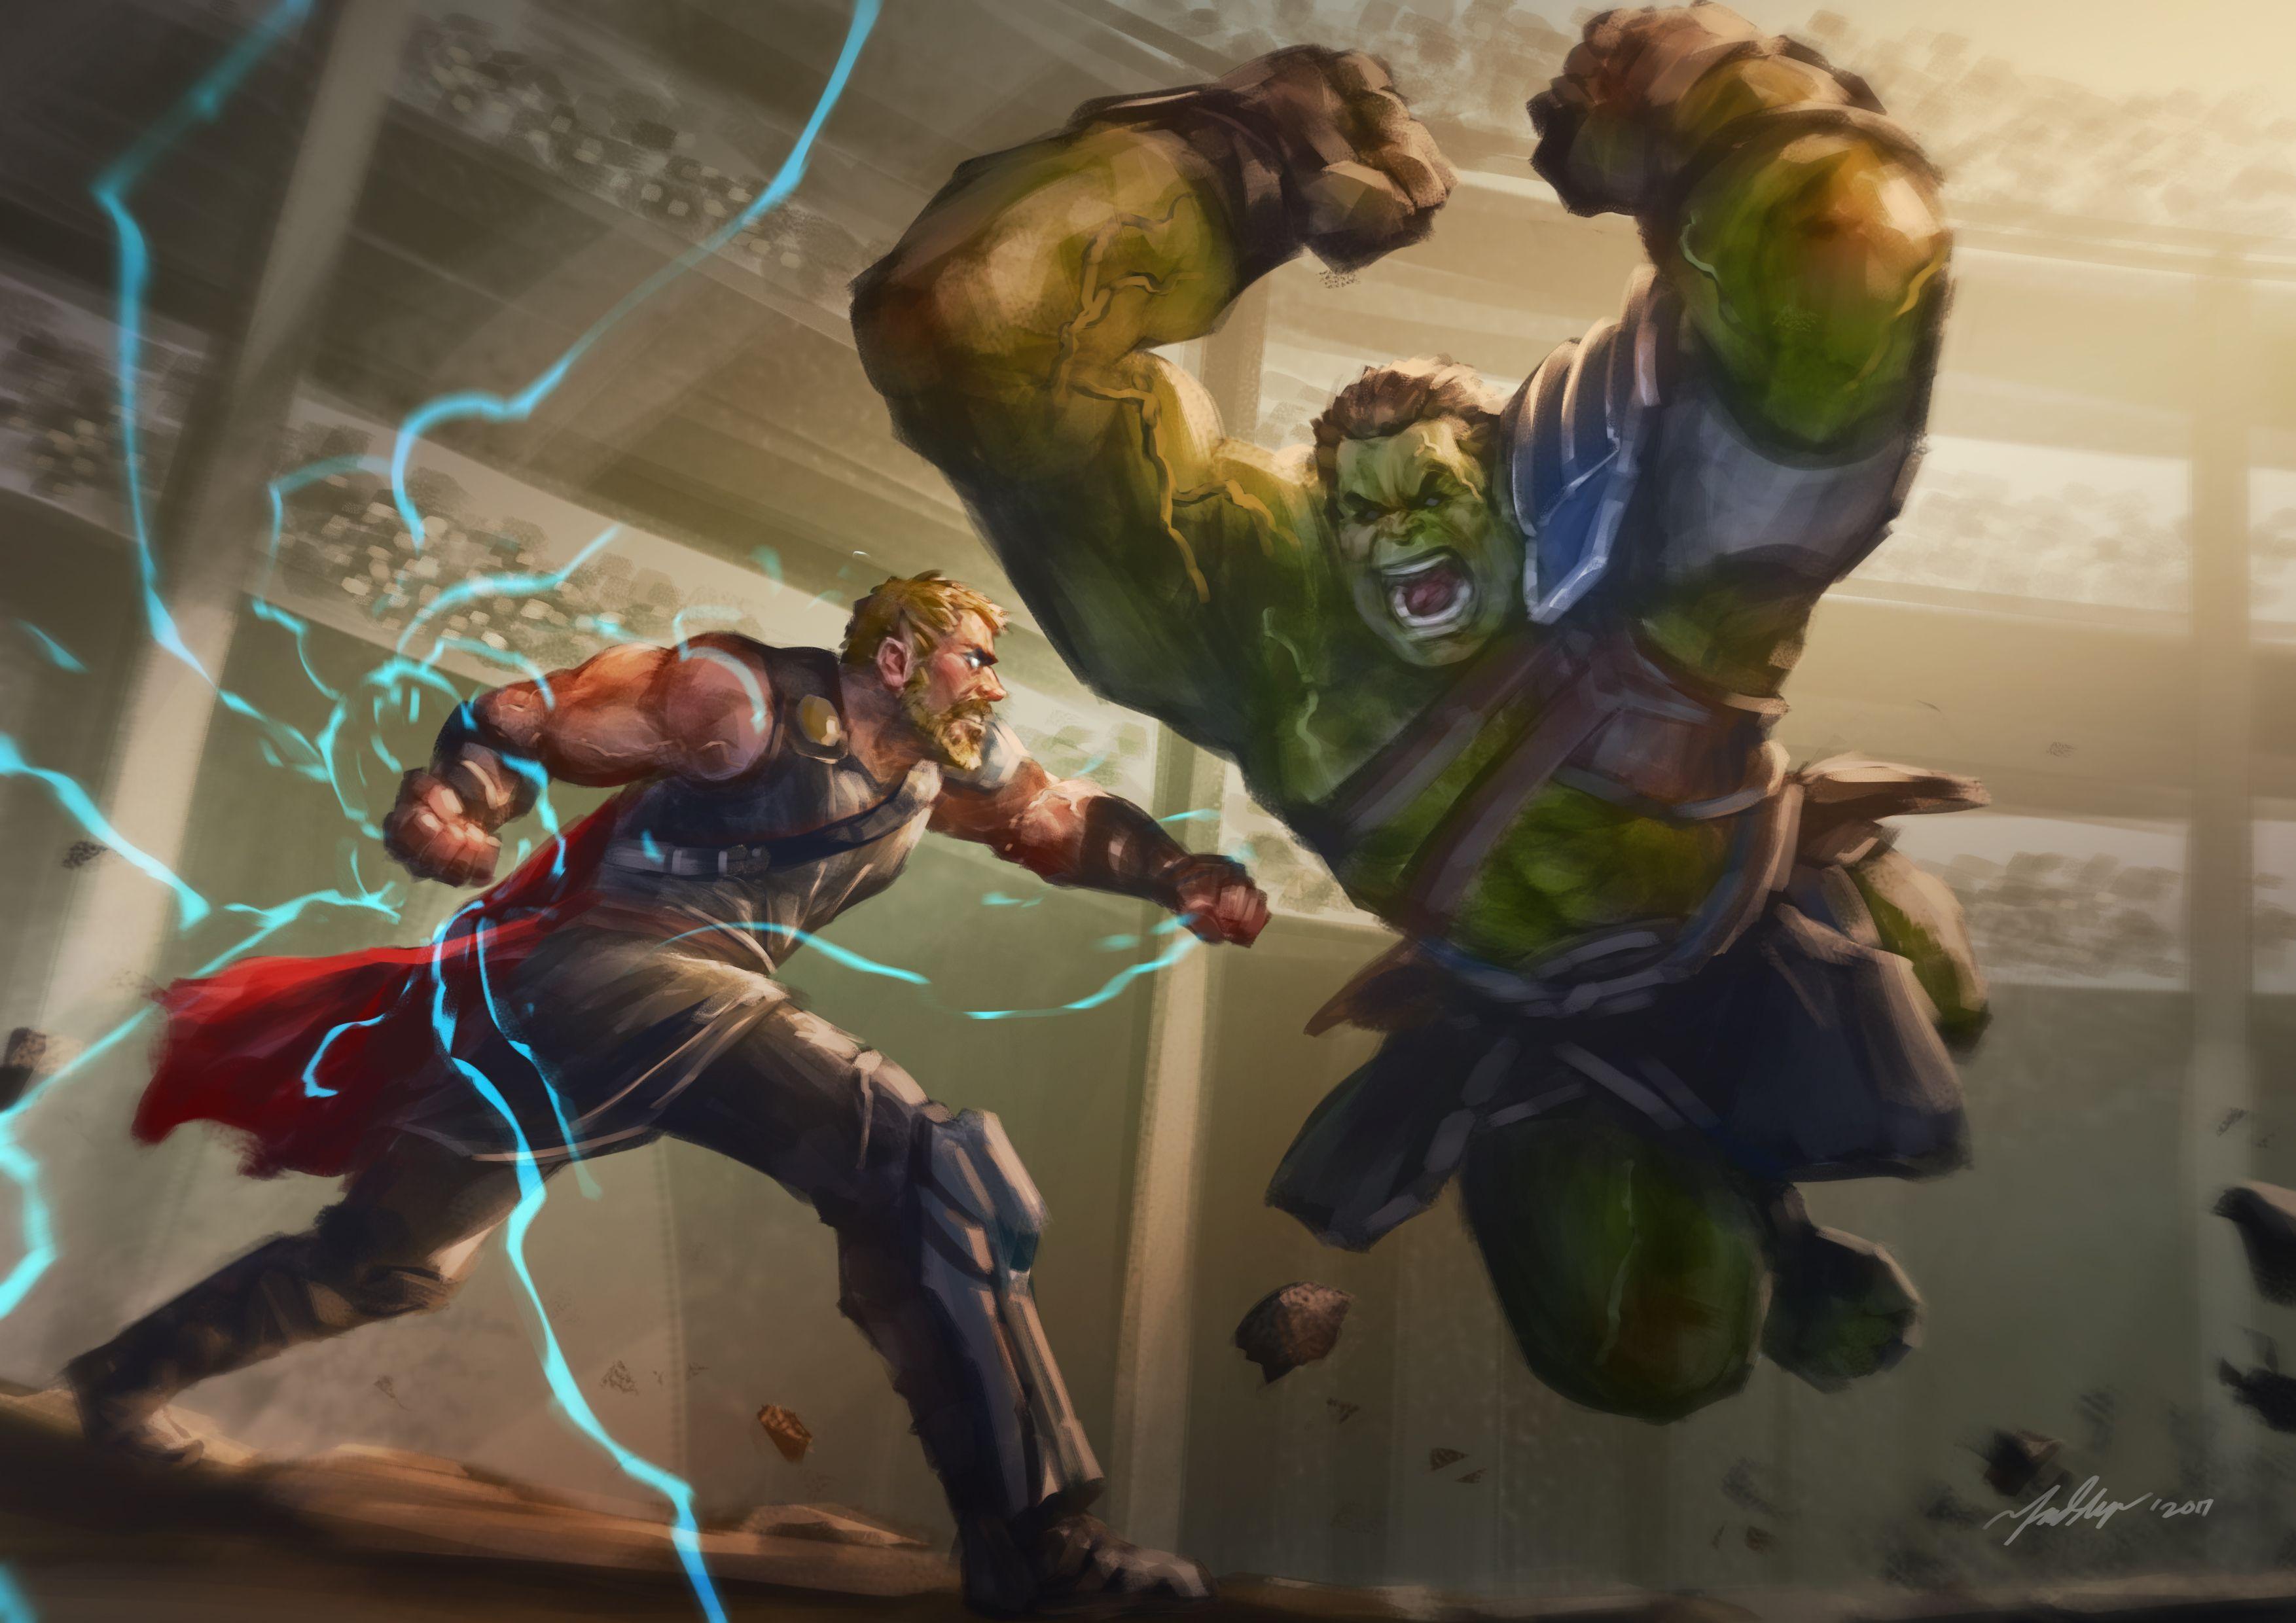 Hulk Vs Thor Wallpapers Top Free Hulk Vs Thor Backgrounds